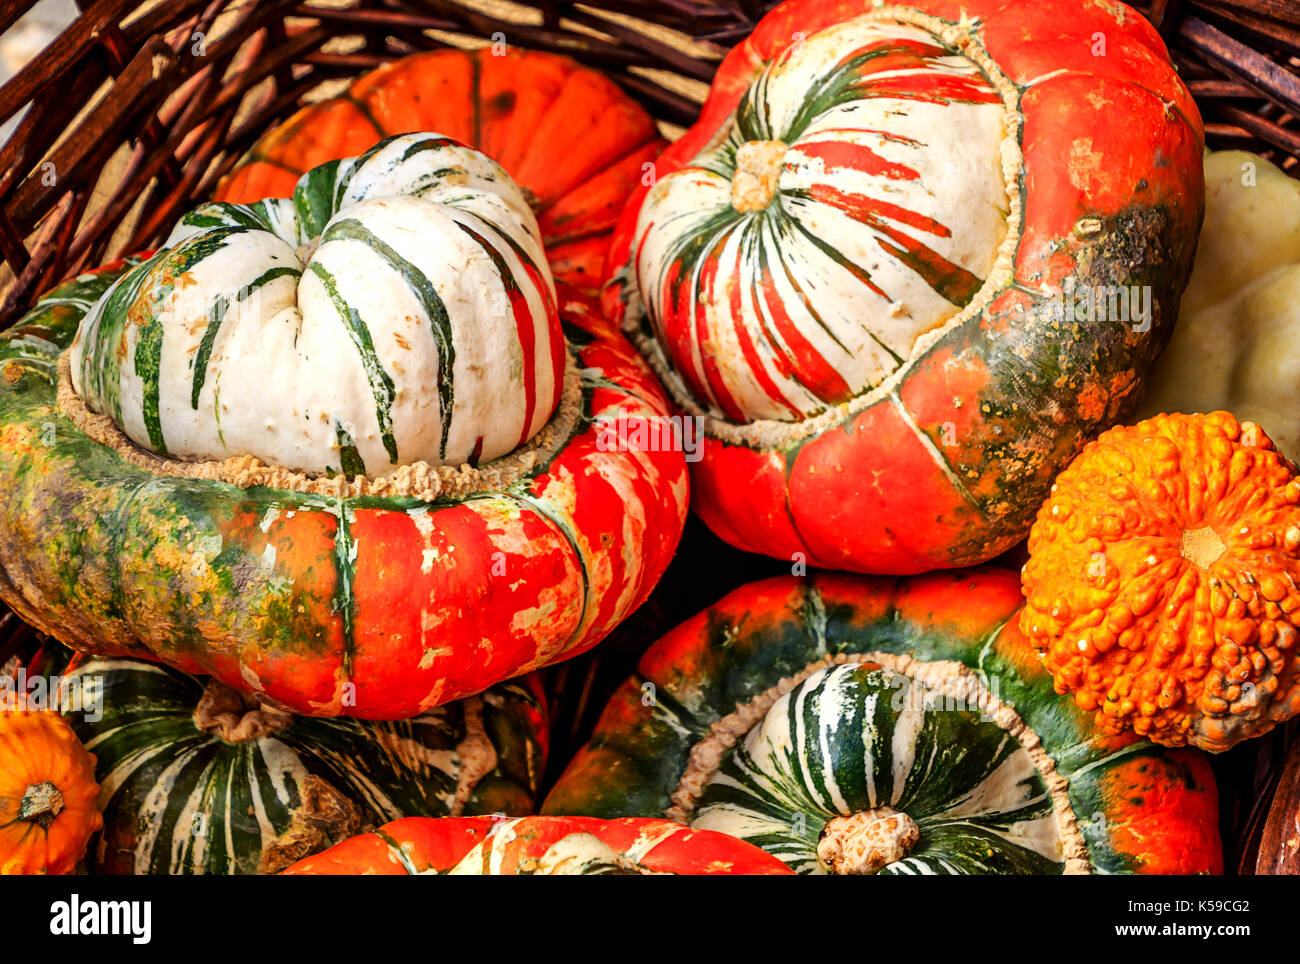 "Big and beautiful ""Turks Turban"" or French Turban Squashes Stock Photo"